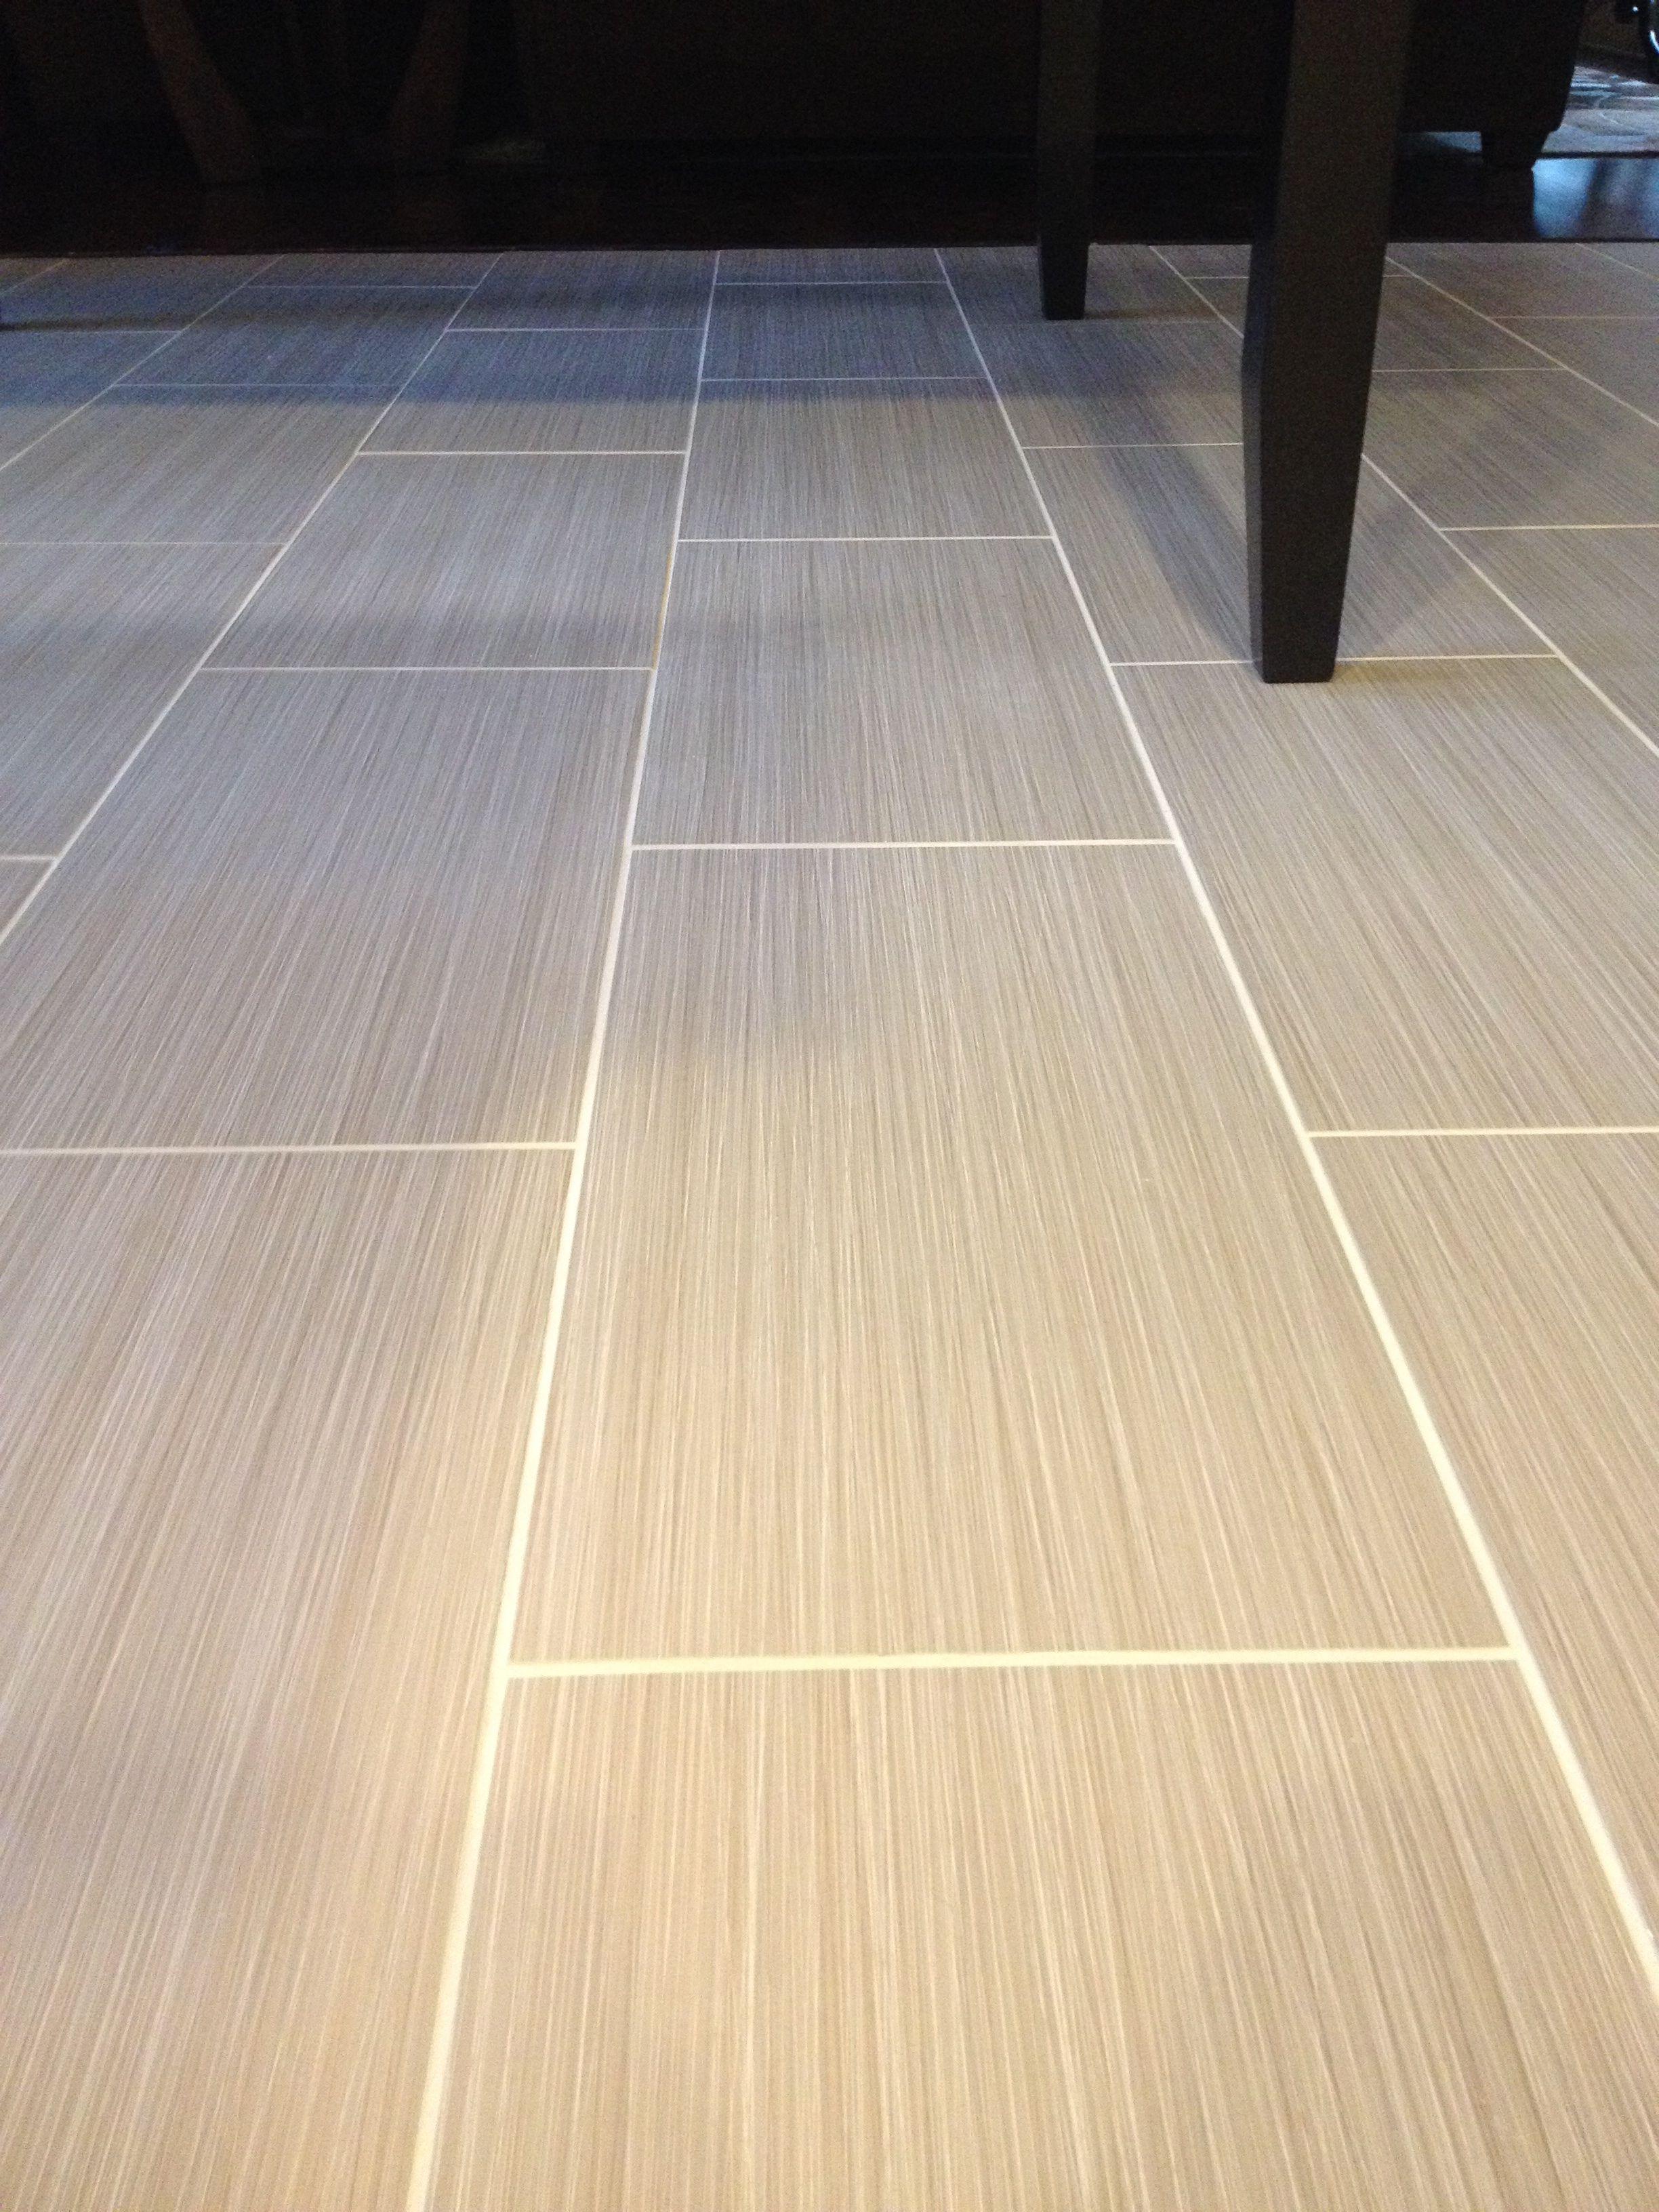 Floor tile fabrique gris linen unpolished bricklay pattern with floor tile fabrique gris linen unpolished bricklay pattern with oyster grey grout by waterton construction dailygadgetfo Image collections